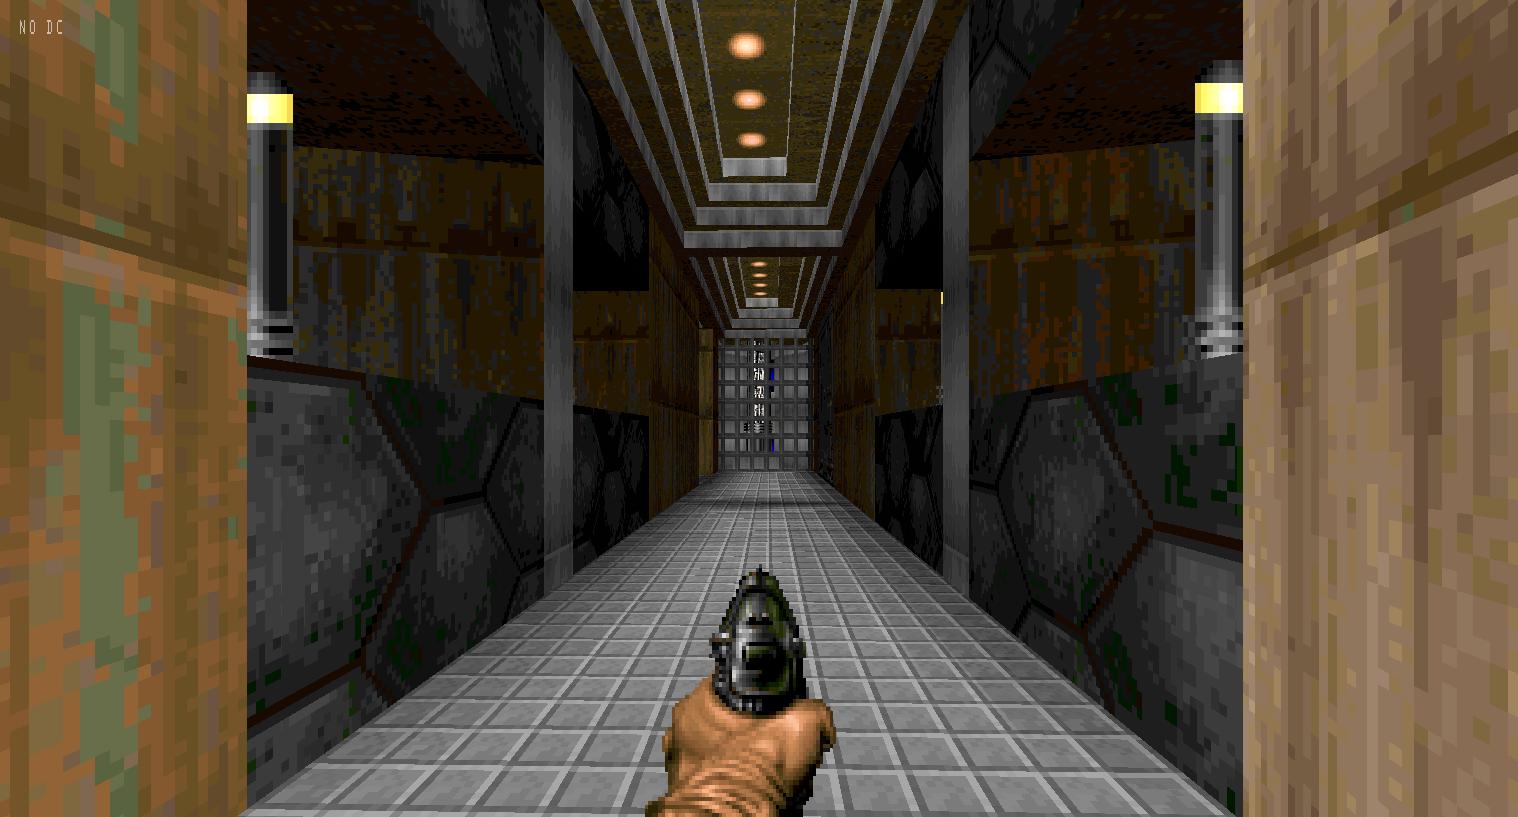 Screenshot_Doom_20210822_000842.png.2ff8434ca80c1ef44c7c3df8a4eafb3c.png